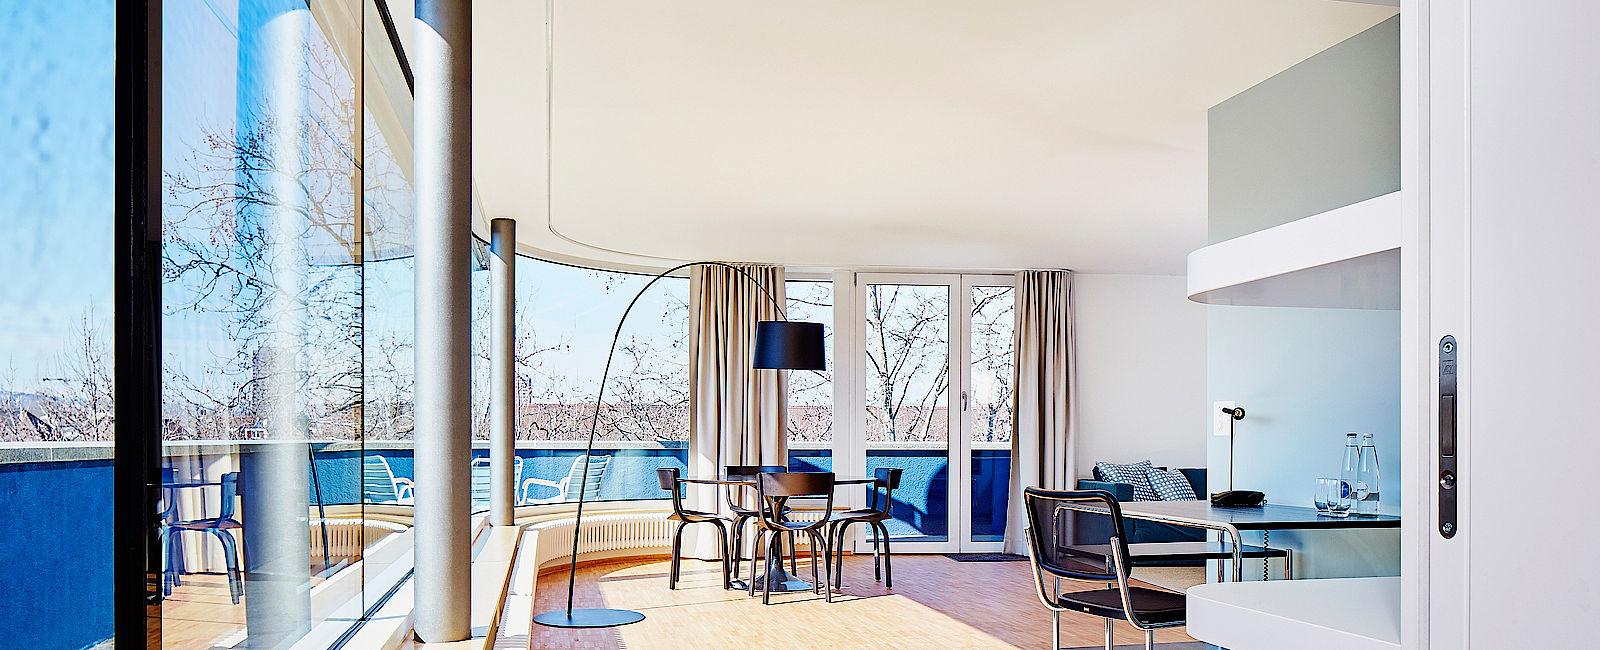 Greulich Connoisseur Circle Hoteltest